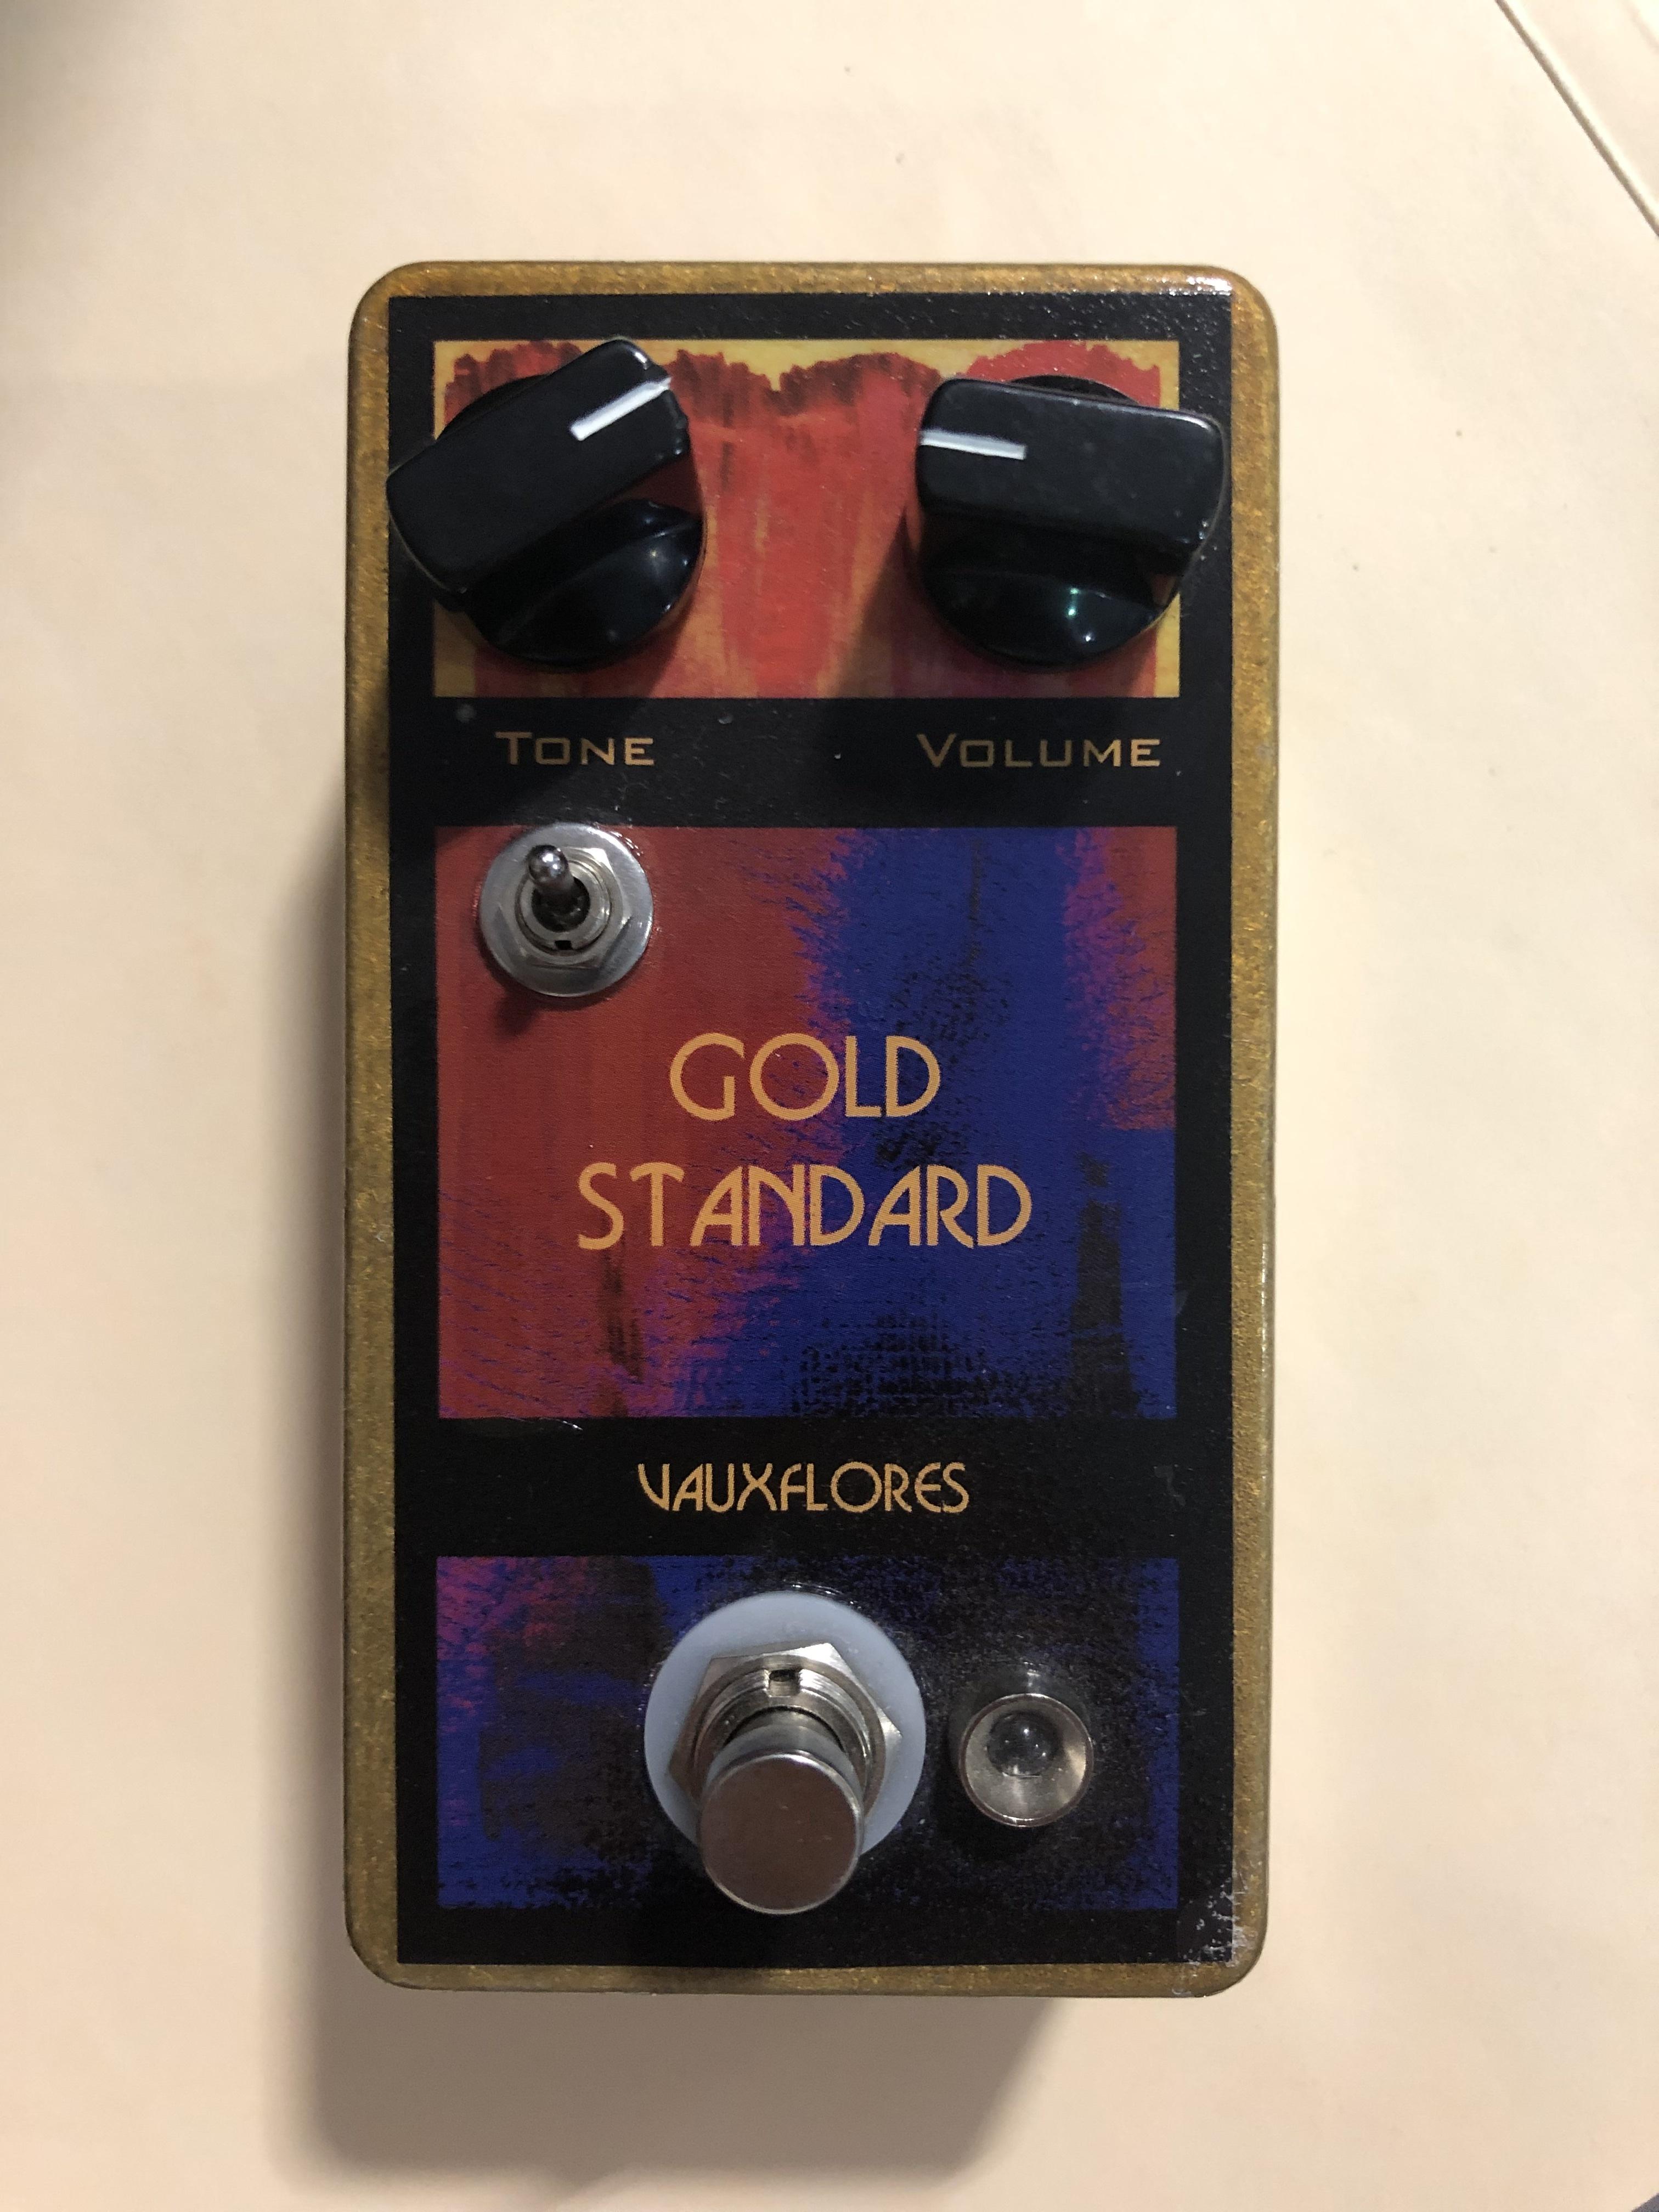 VAUXFLORES - GOLD STANDARD - FUZZ EFFECTS PEDAL